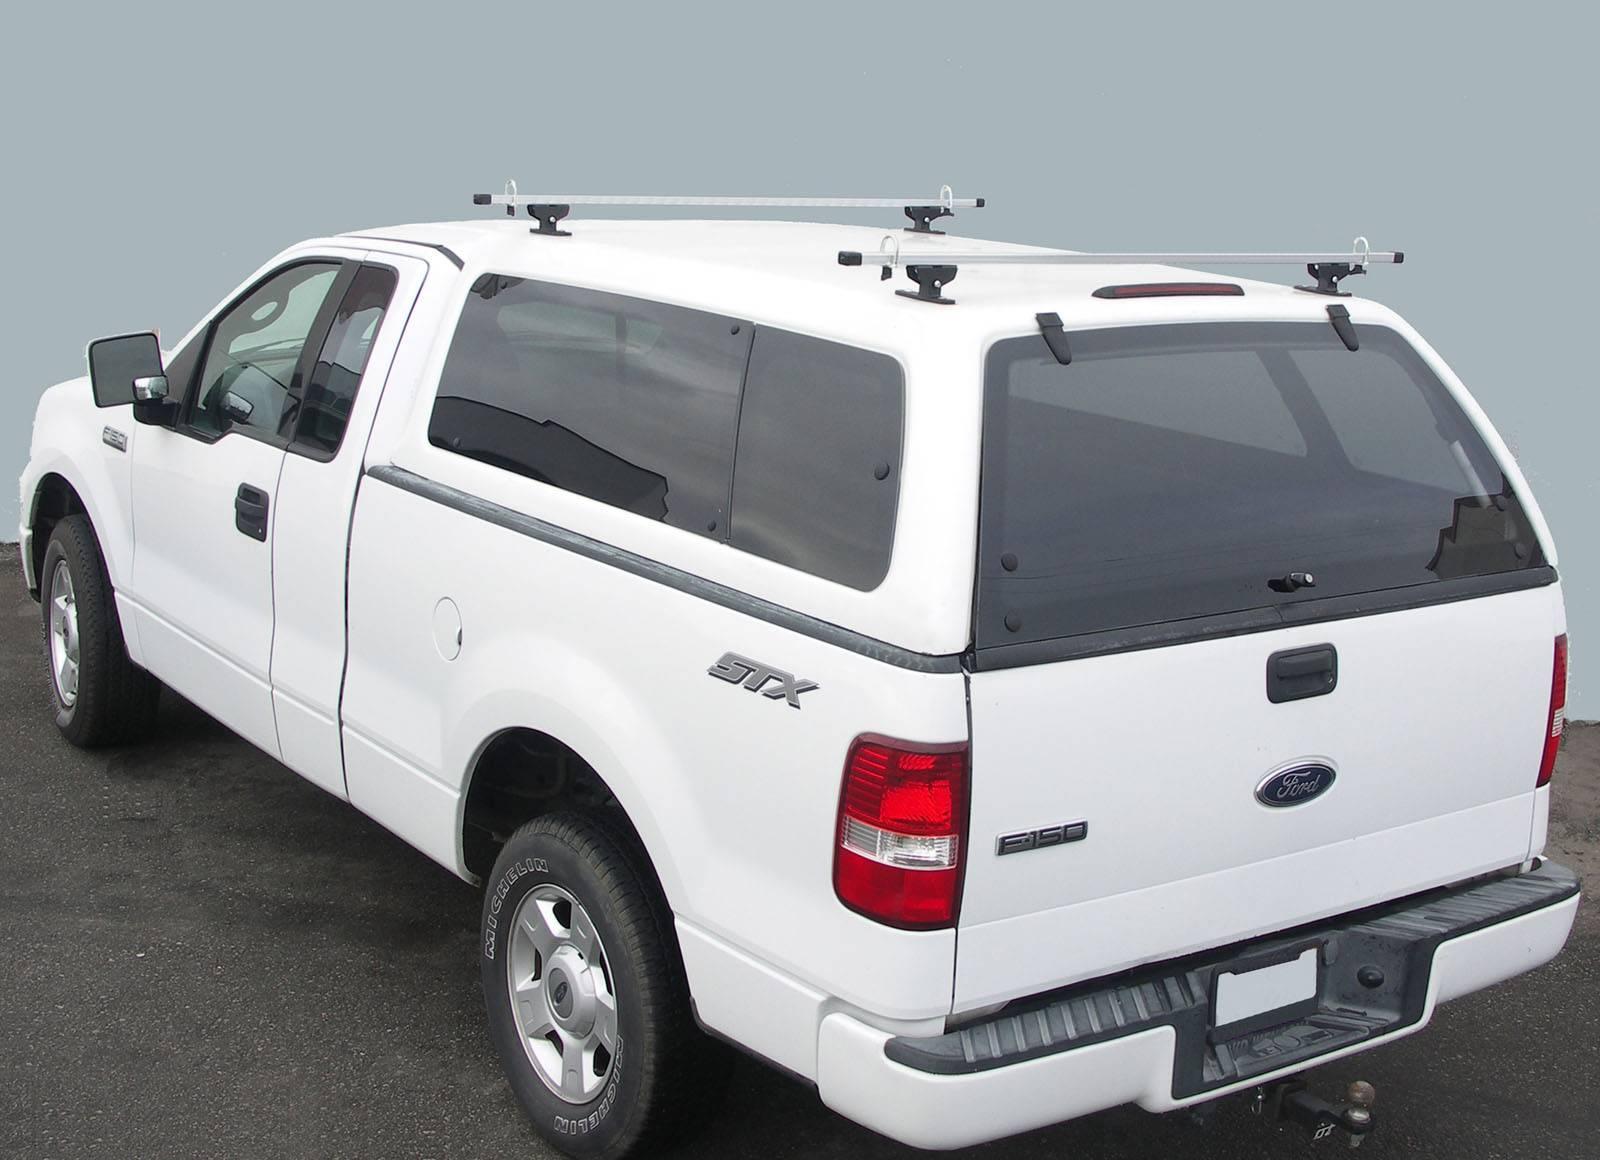 Crosstopper Truck Rack, Truck Cap, Brushed Cross Bar With Black Base - PN #82310042